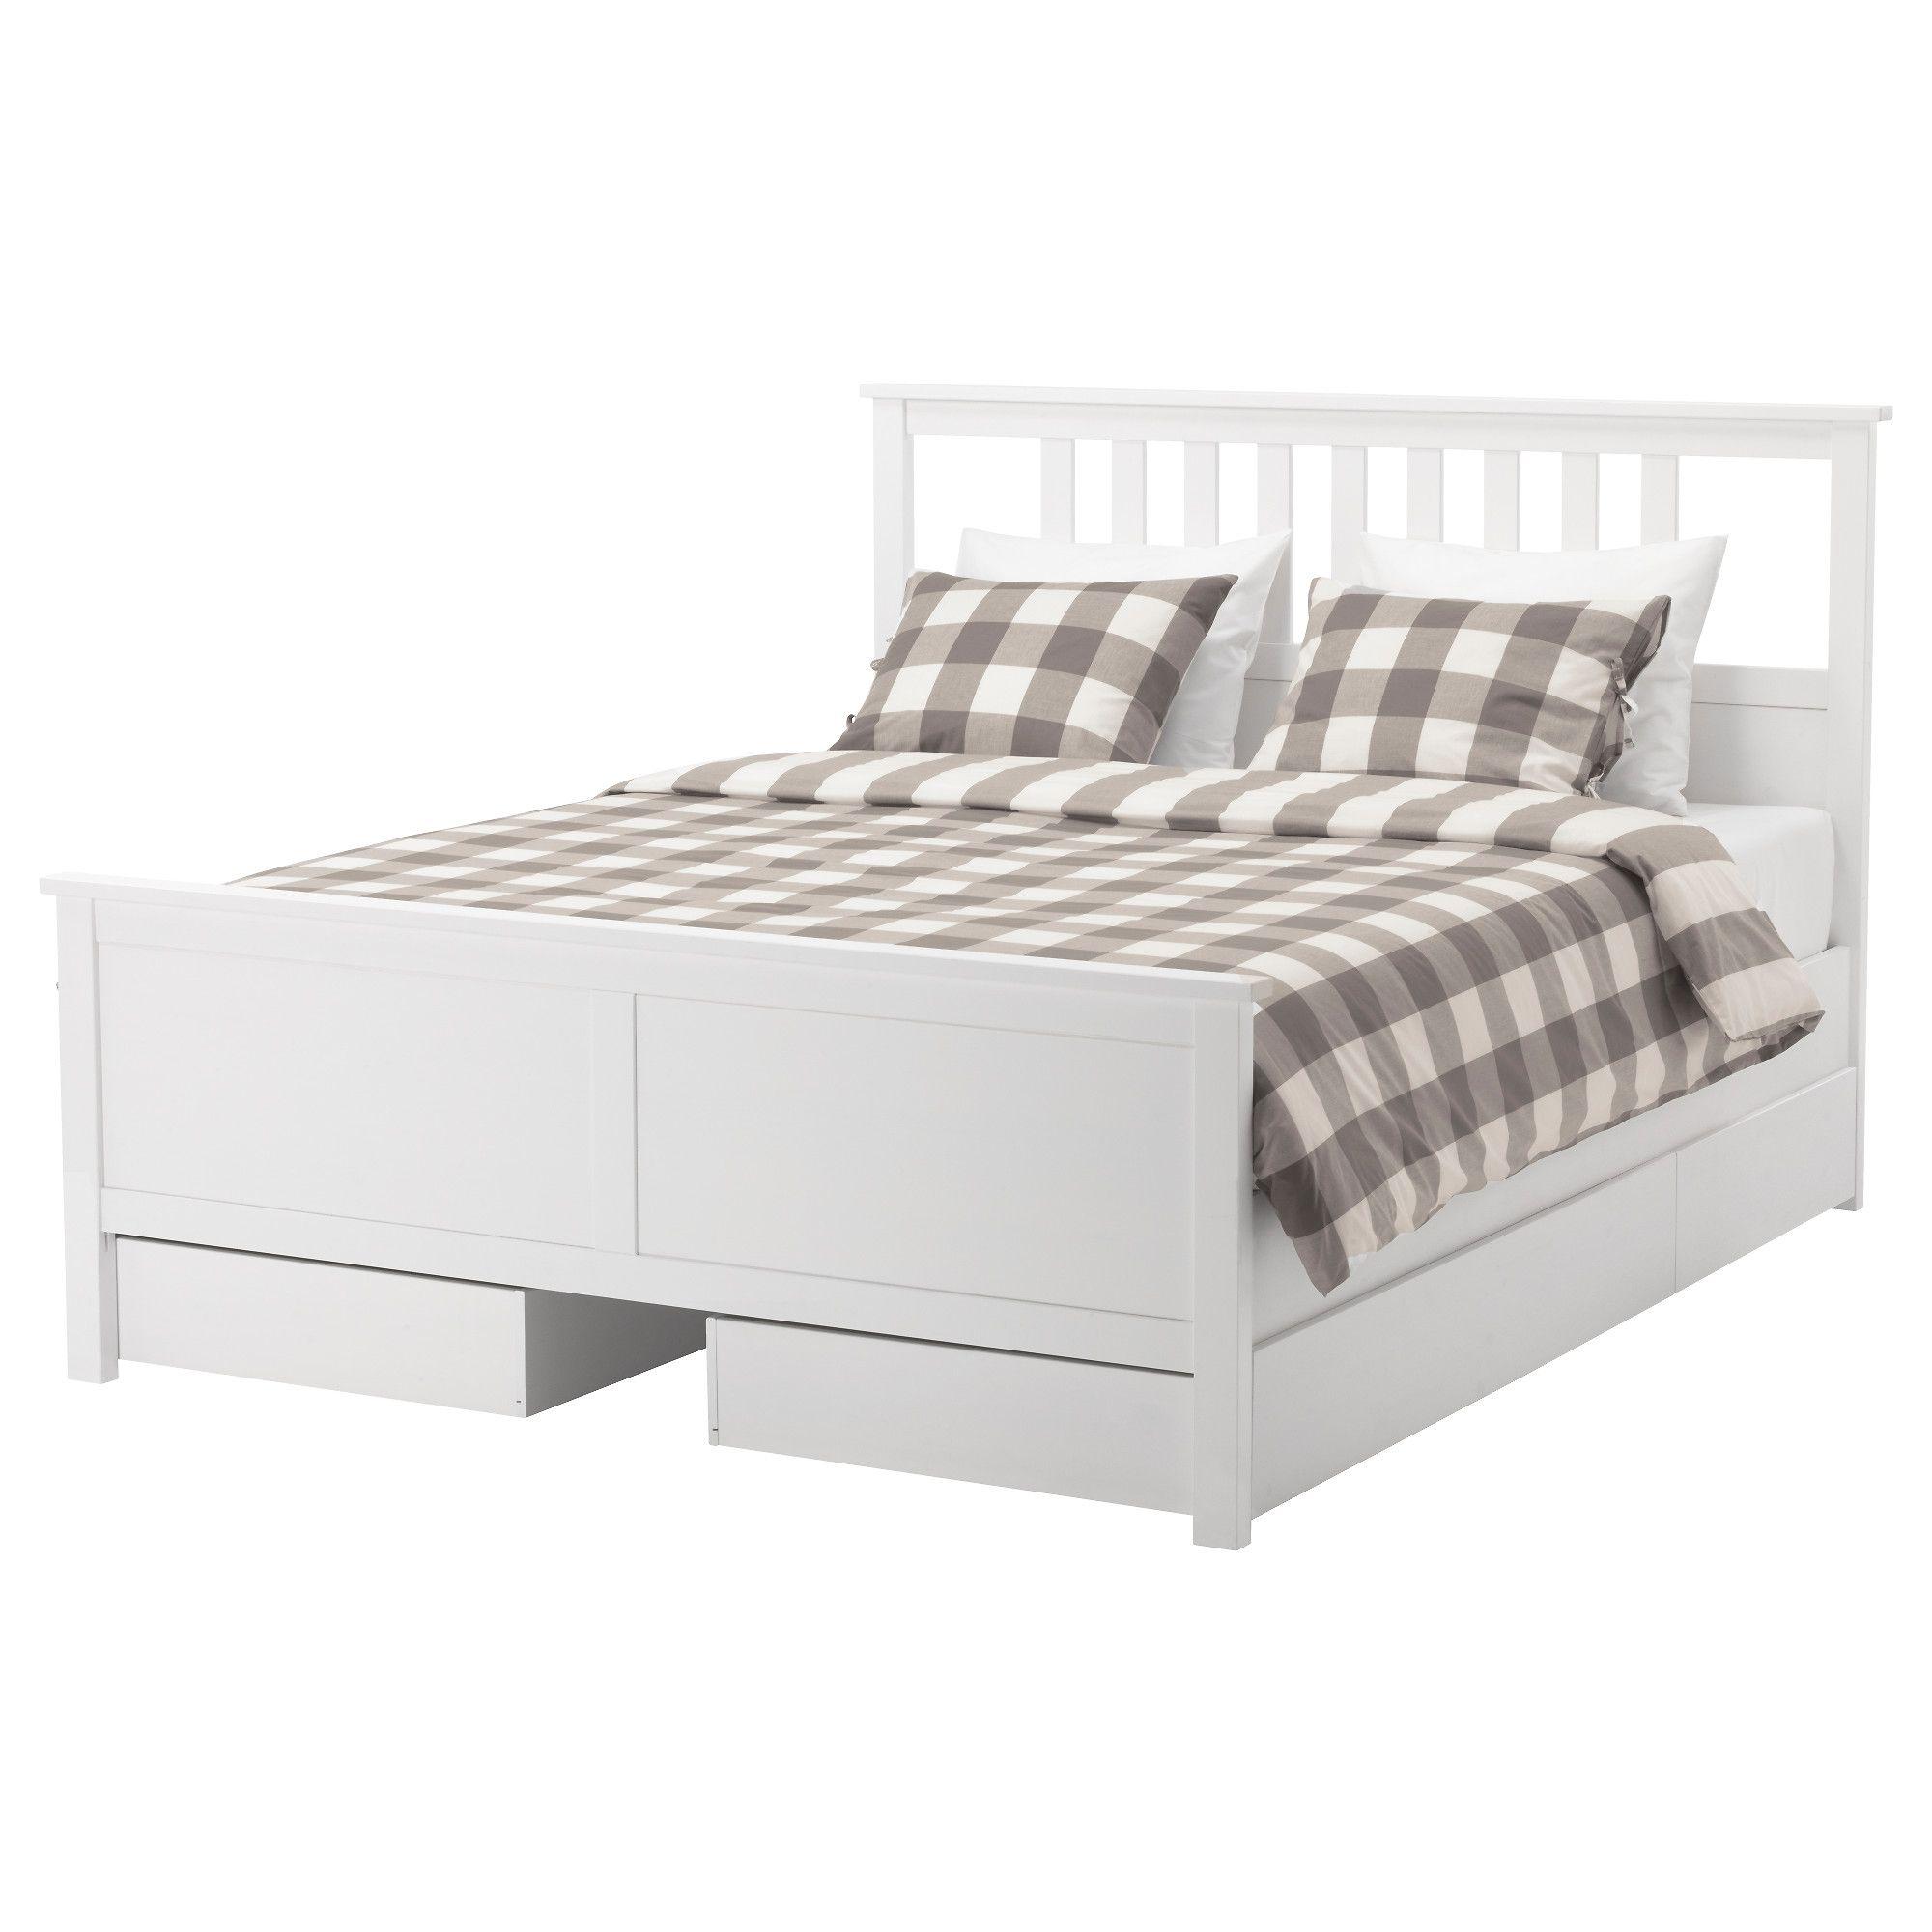 Hemnes Bed Frame With 4 Storage Bo Full Ikea